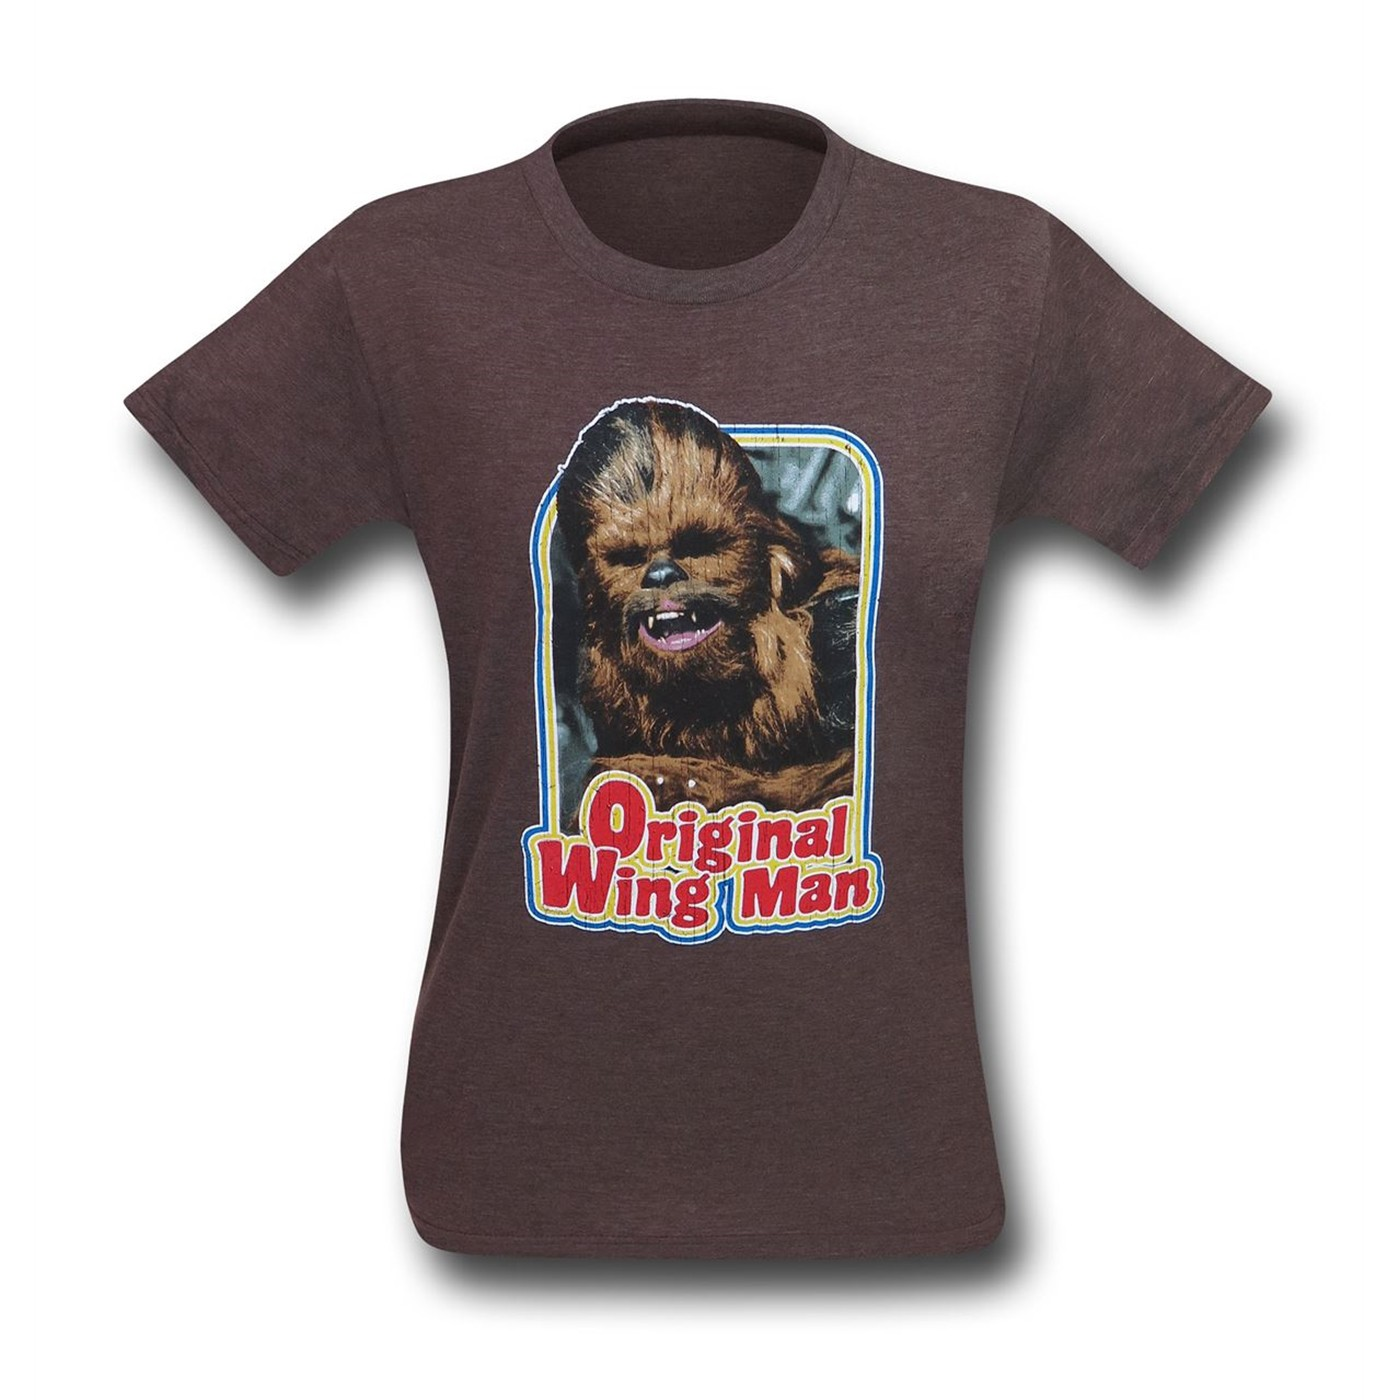 Star Wars Chewie Original Wing Man Men's T-Shirt